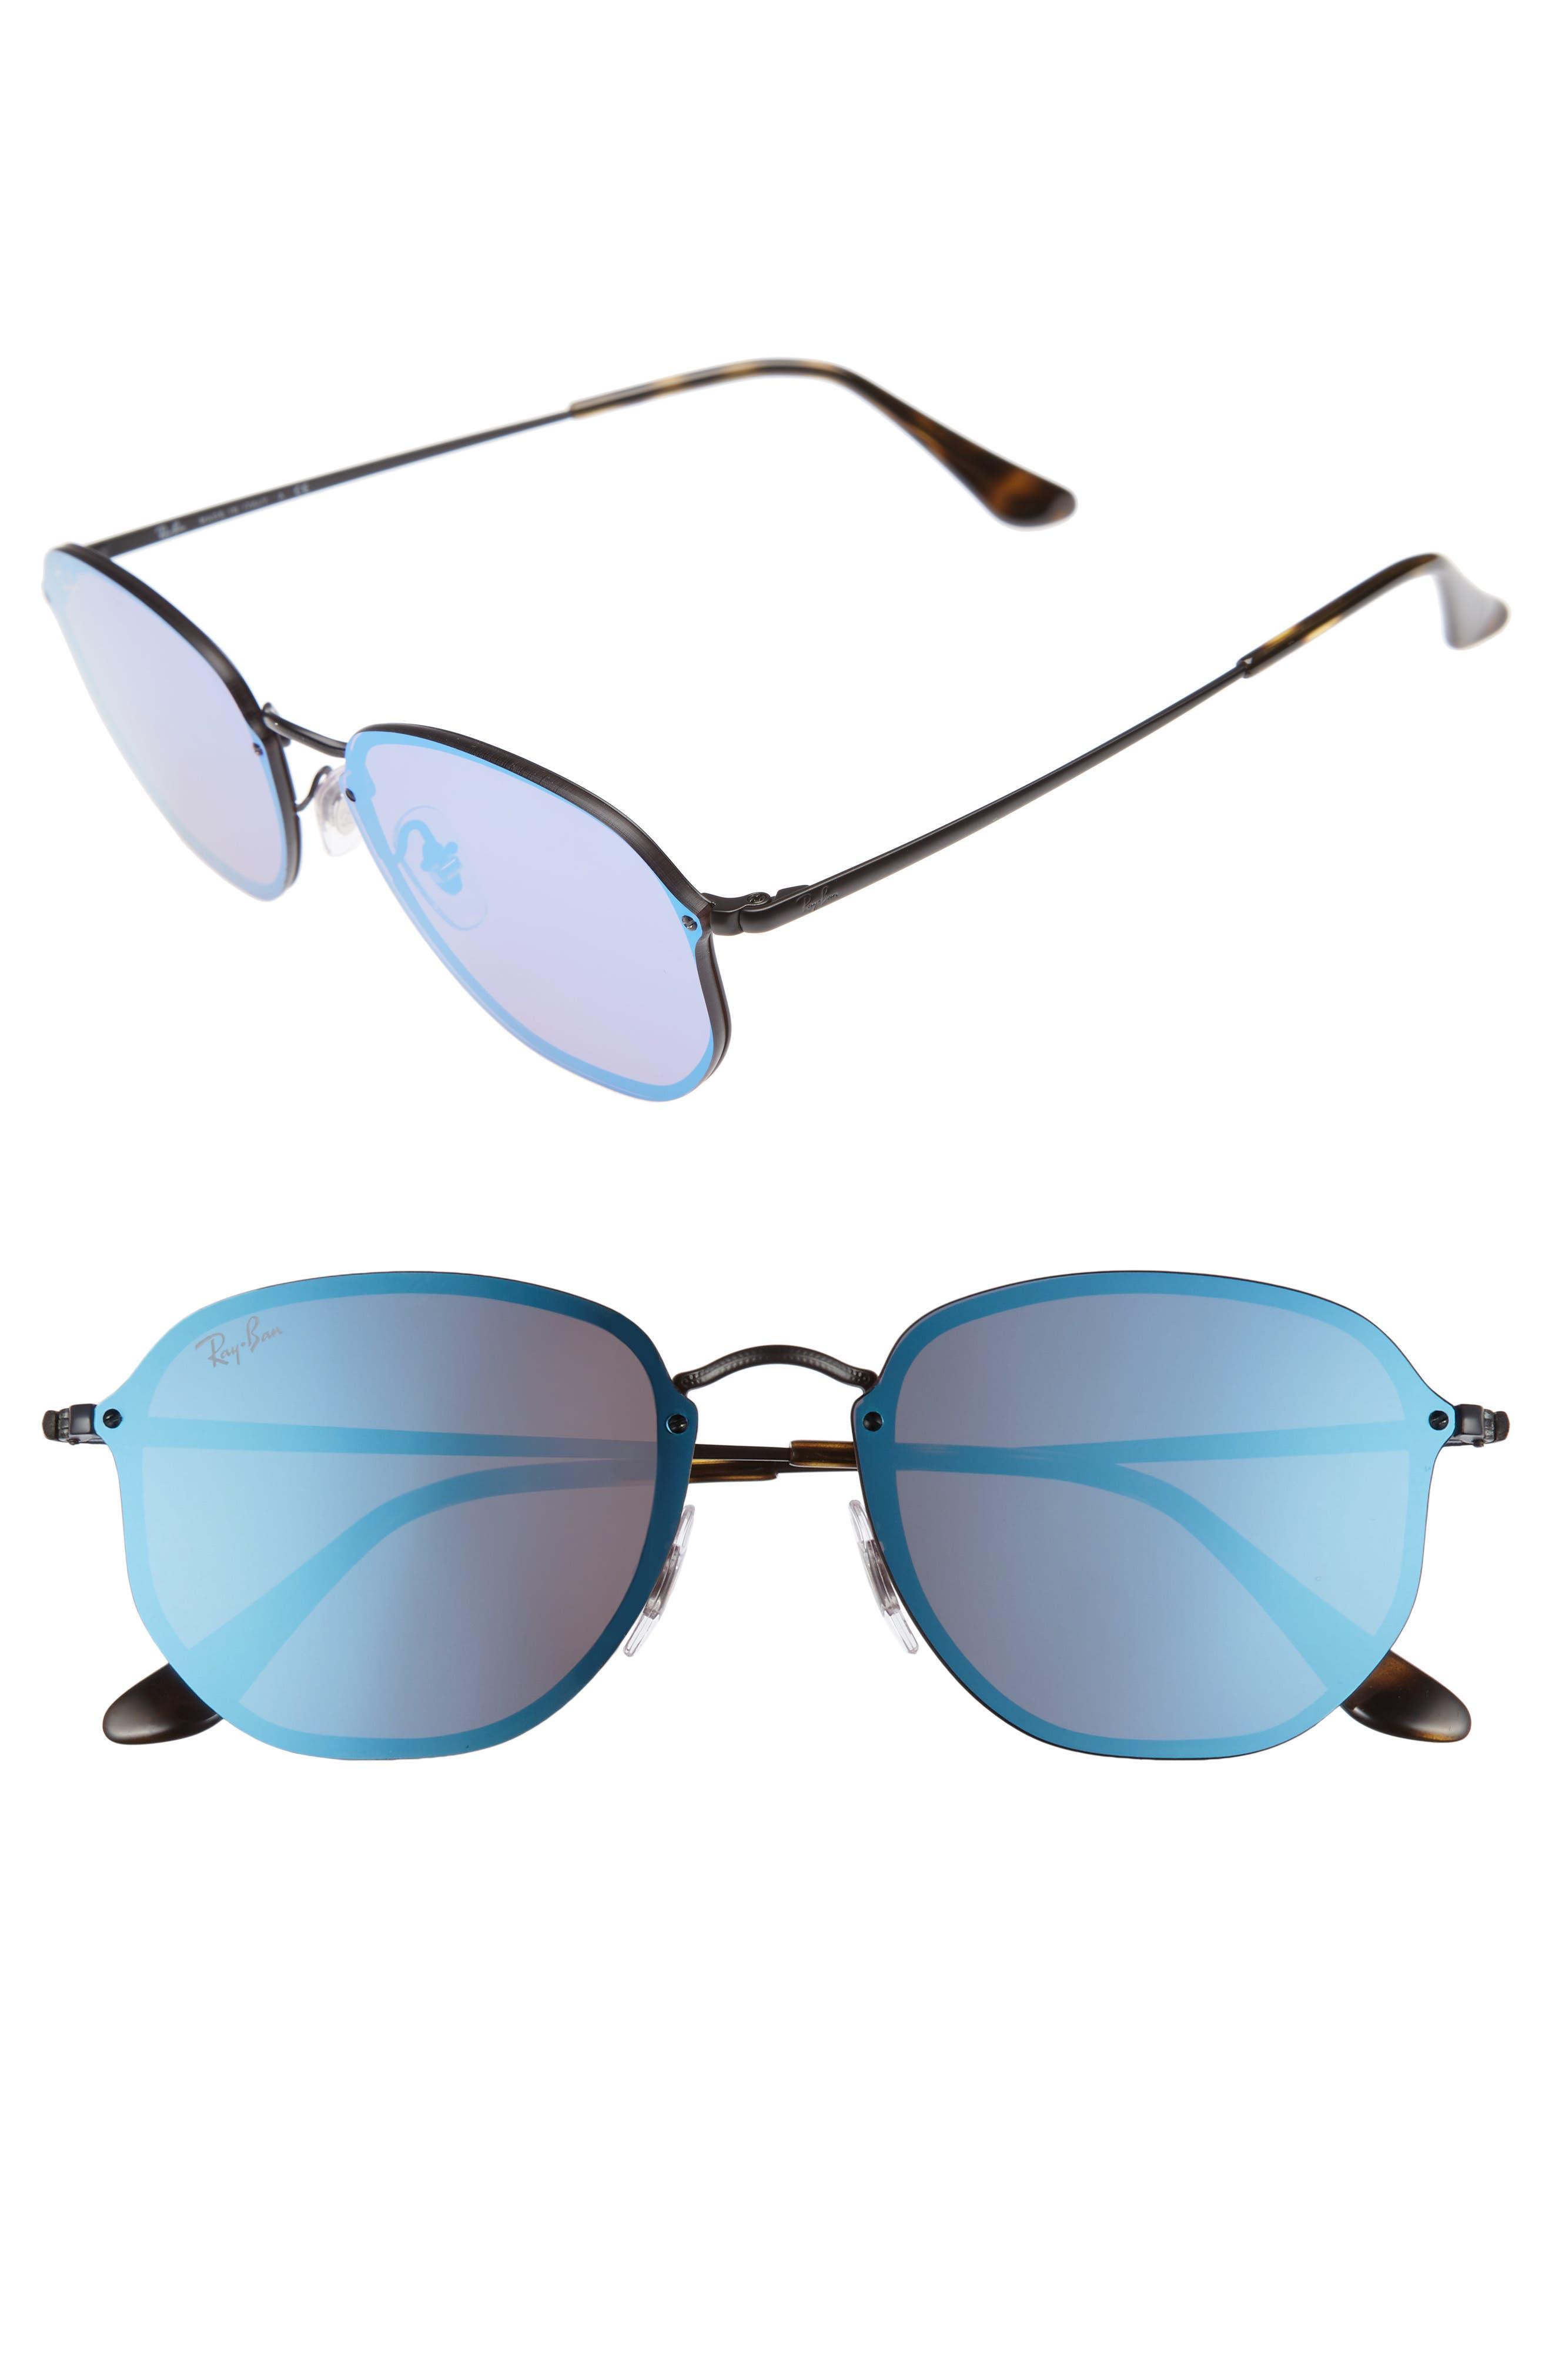 Ray-Ban Erika Classic 5m Sunglasses - Black/ Grey Gradient